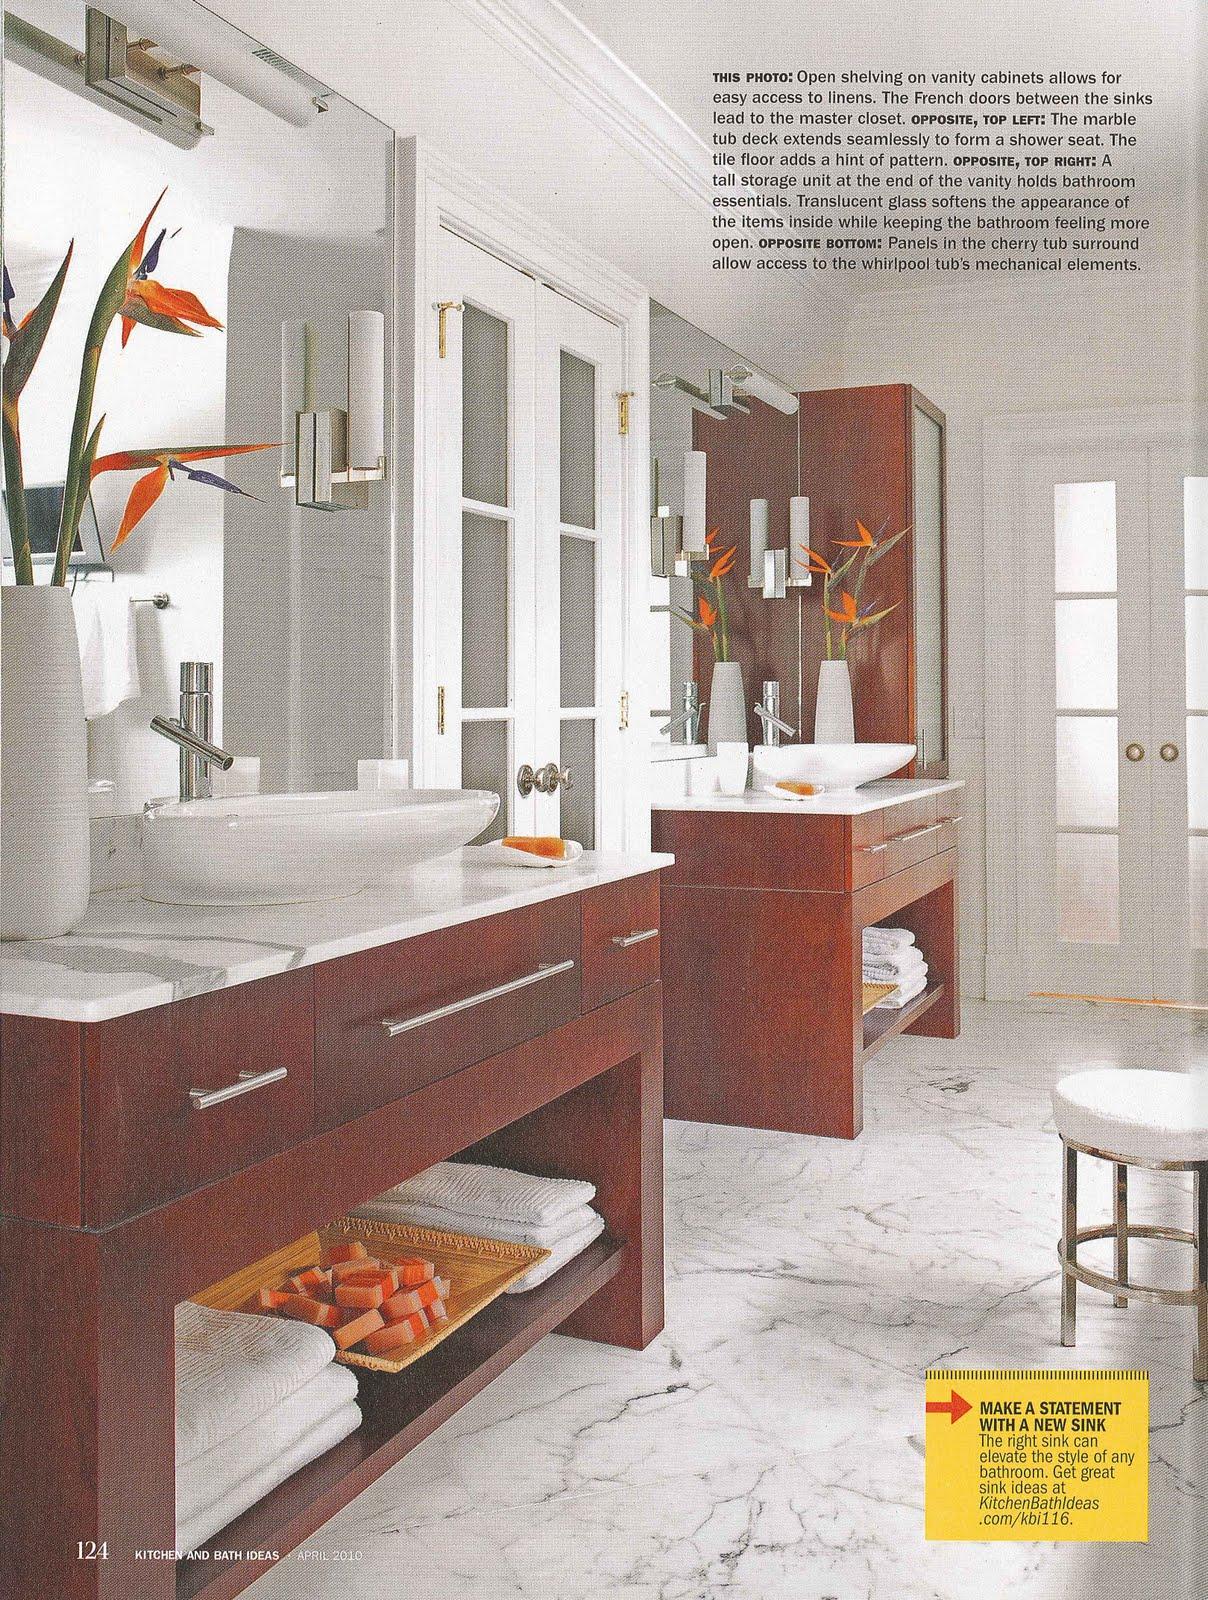 1004 bhg kitchen and bath ideas page 124